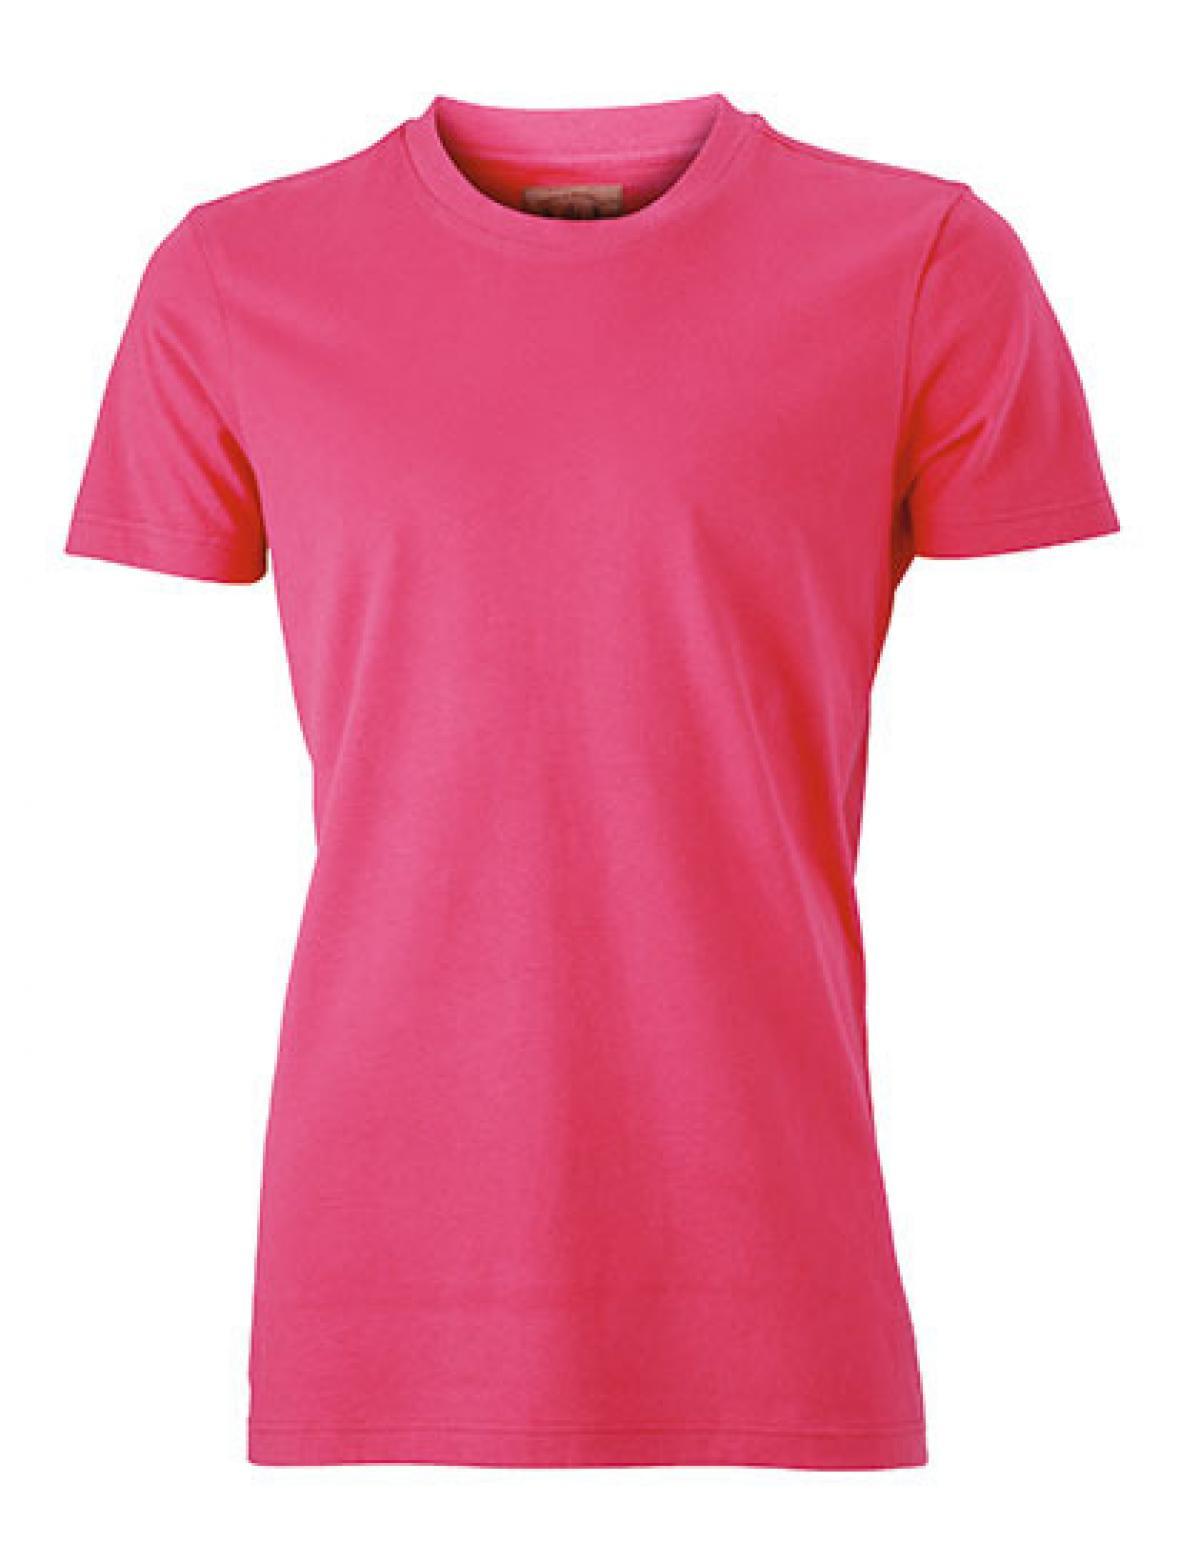 Vintage Mens T Shirt 11